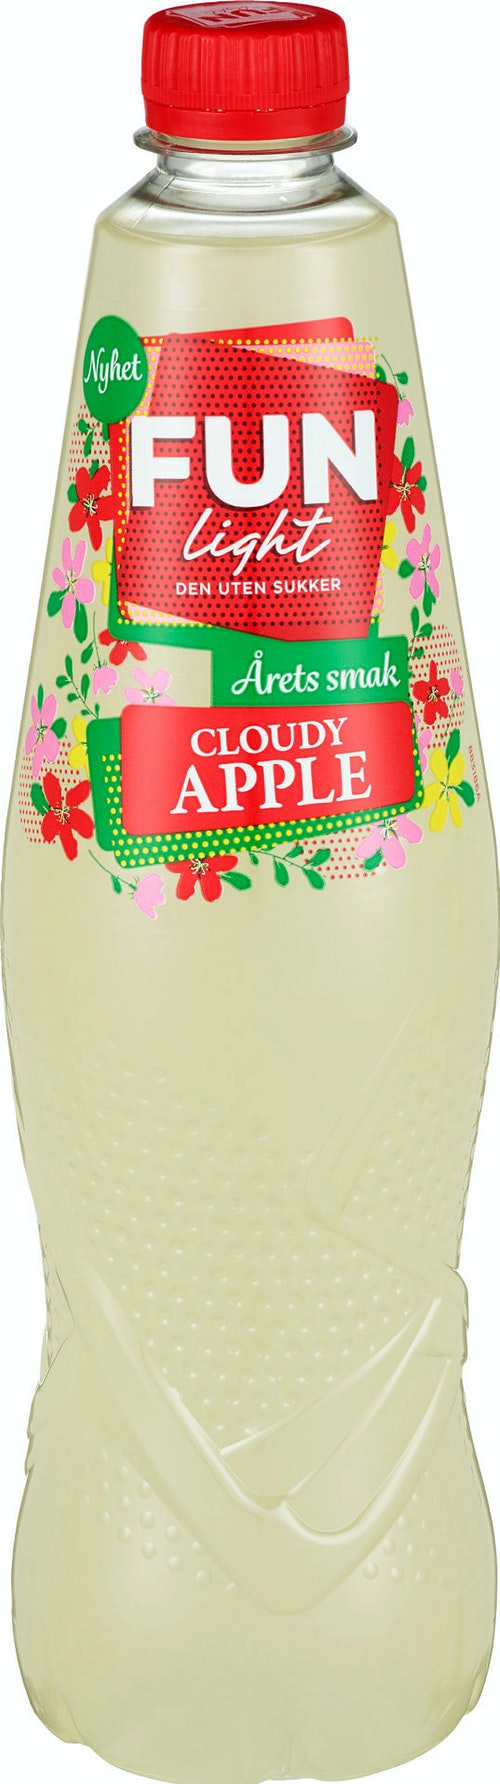 Fun Light Cloudy Apple 0,8 l